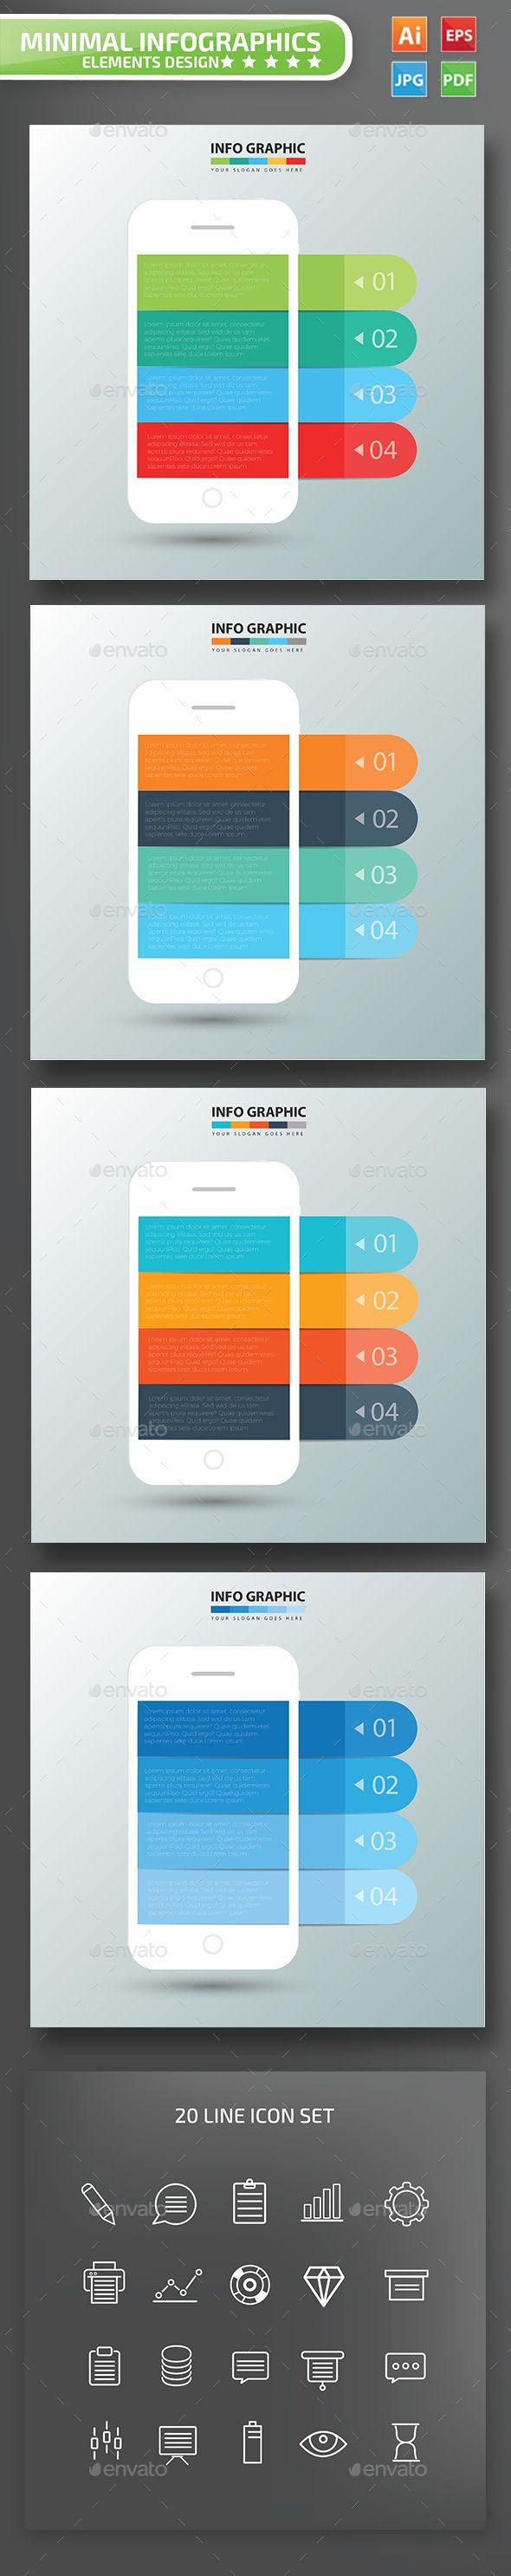 Mobile phone Infographic Design Infographic design